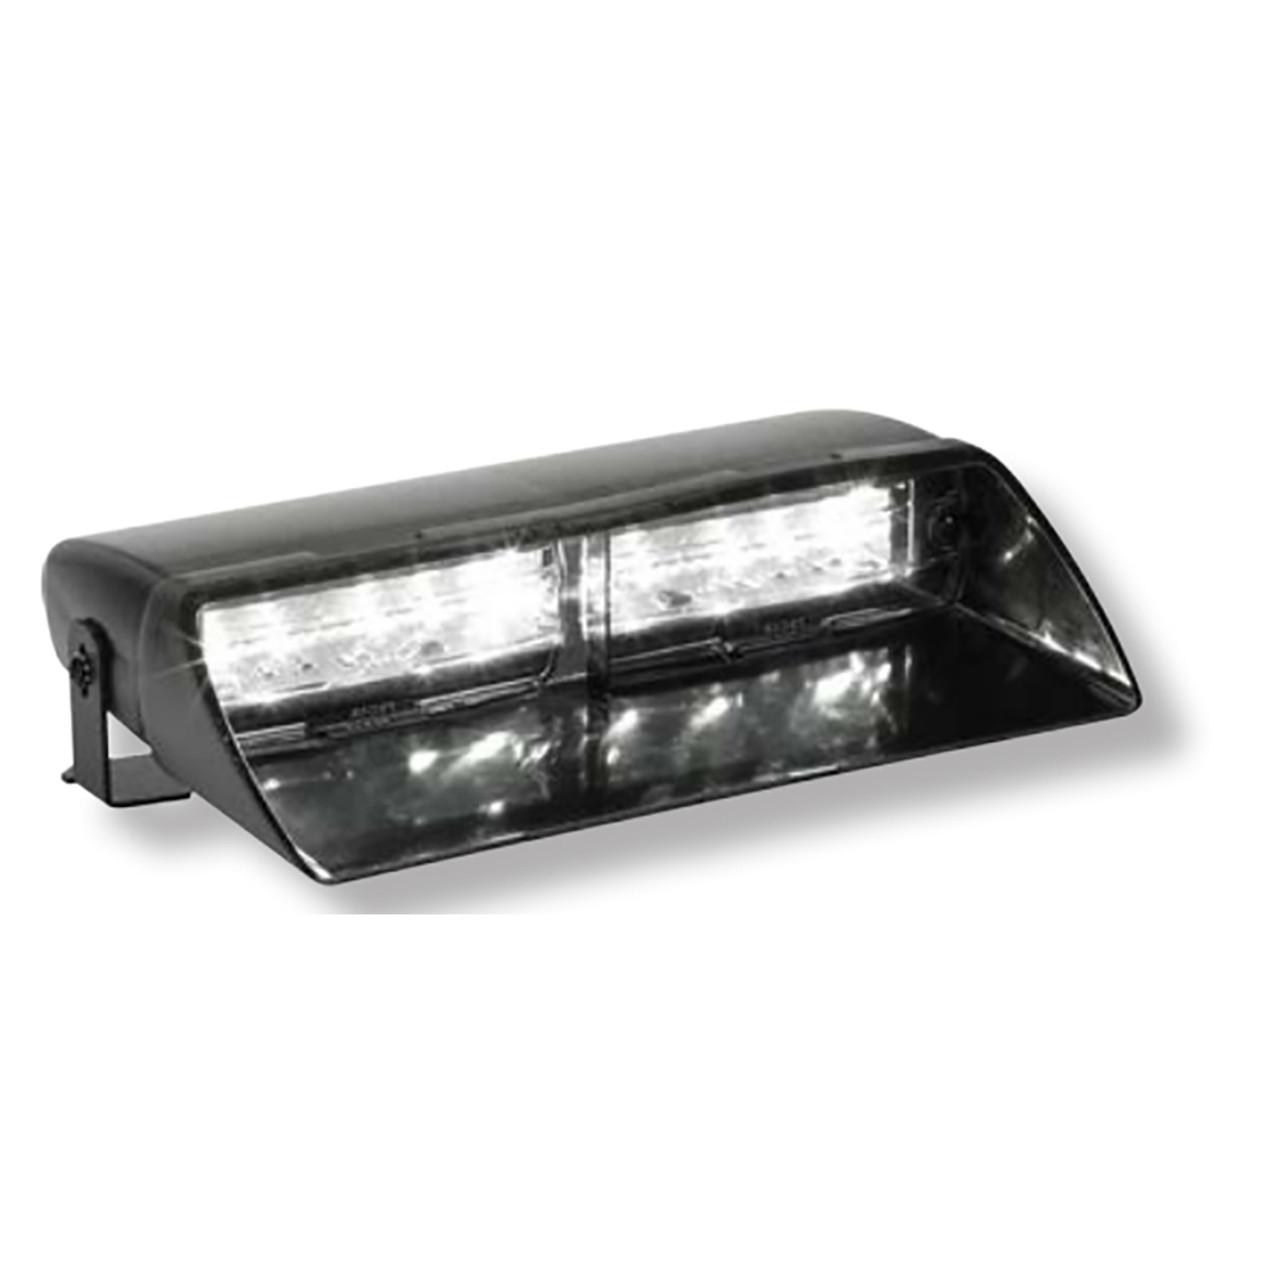 Federal Signal Viper S2 Dual-head Dual-color LED Dash Deck Light - Spectralux